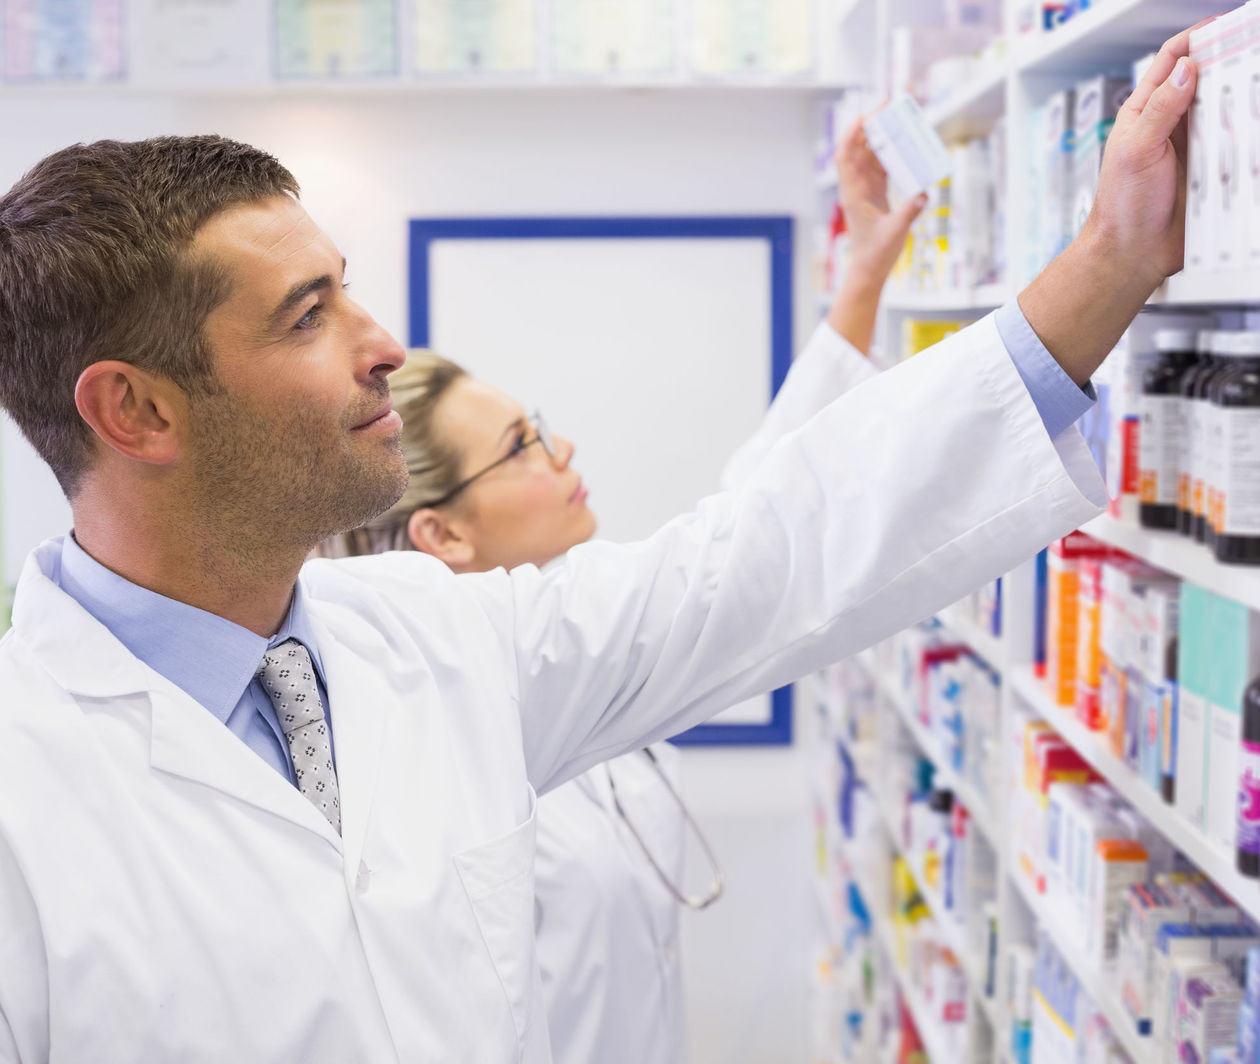 Essentials of Good Pharmacy Practice: The Basics